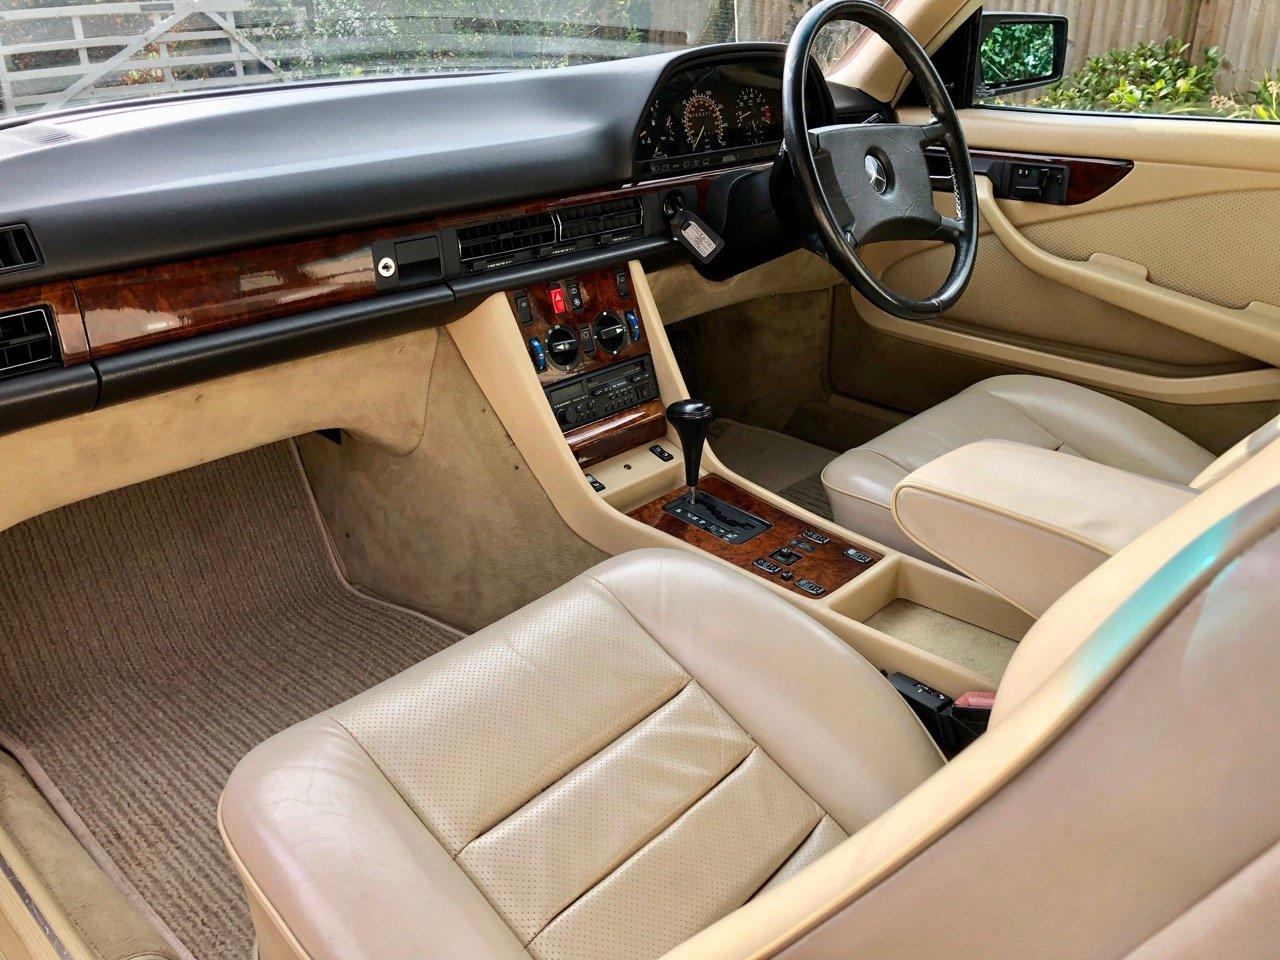 1988- Mercedes 420SEC C126 *SOLD-MORE REQD* 560SEC 500 SEC For Sale (picture 4 of 6)